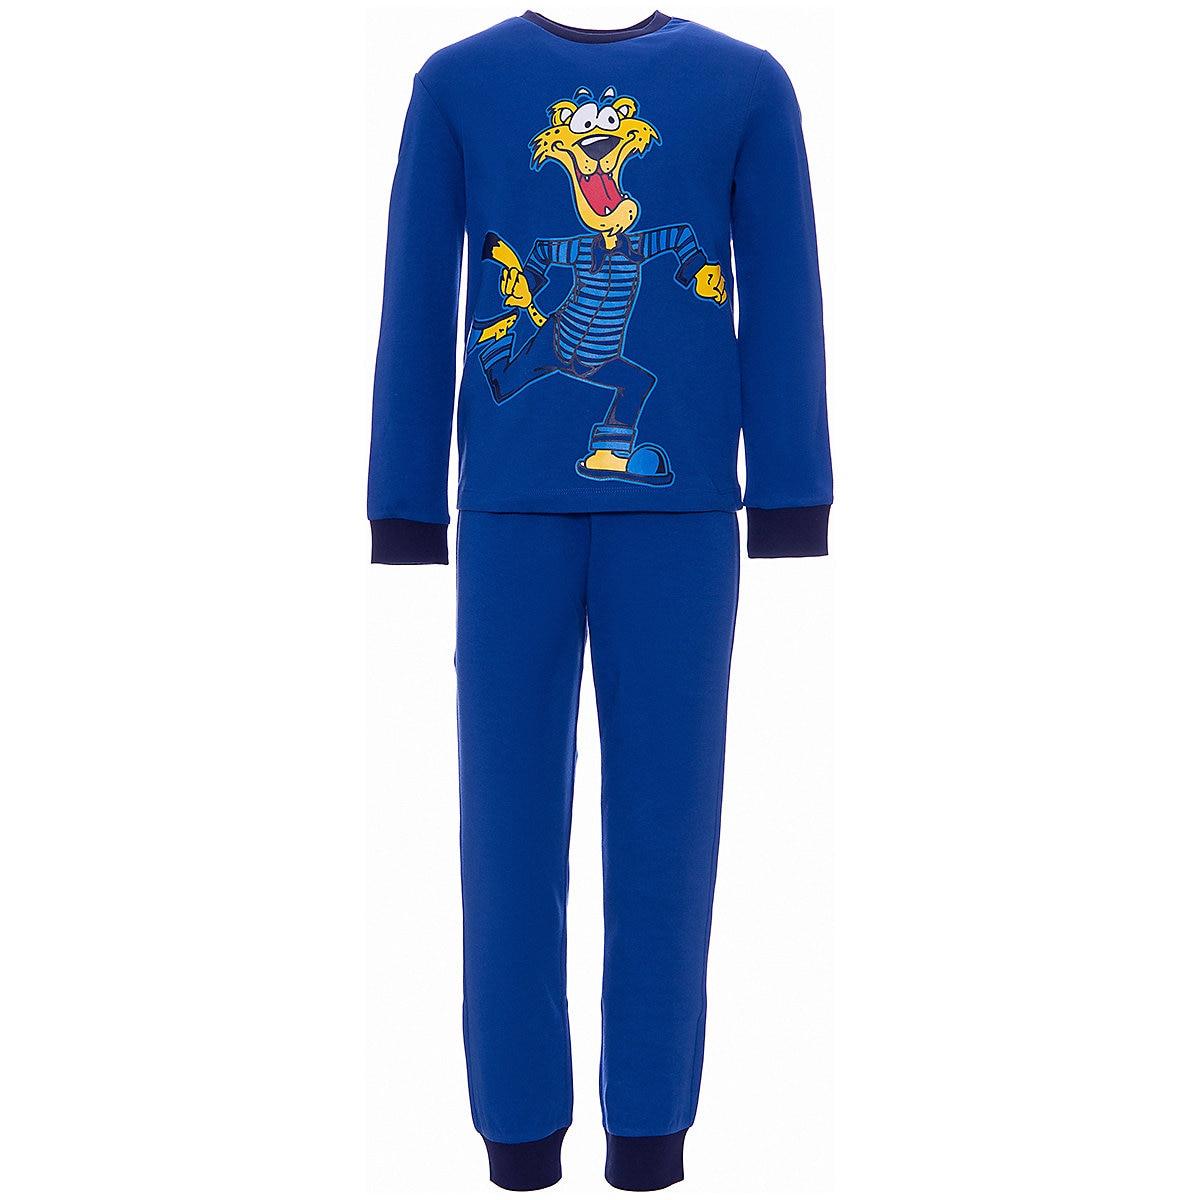 ORIGINAL MARINES Sleepwear & Robes 9501034 Cotton Baby Boys Clothing Pajamas MTpromo